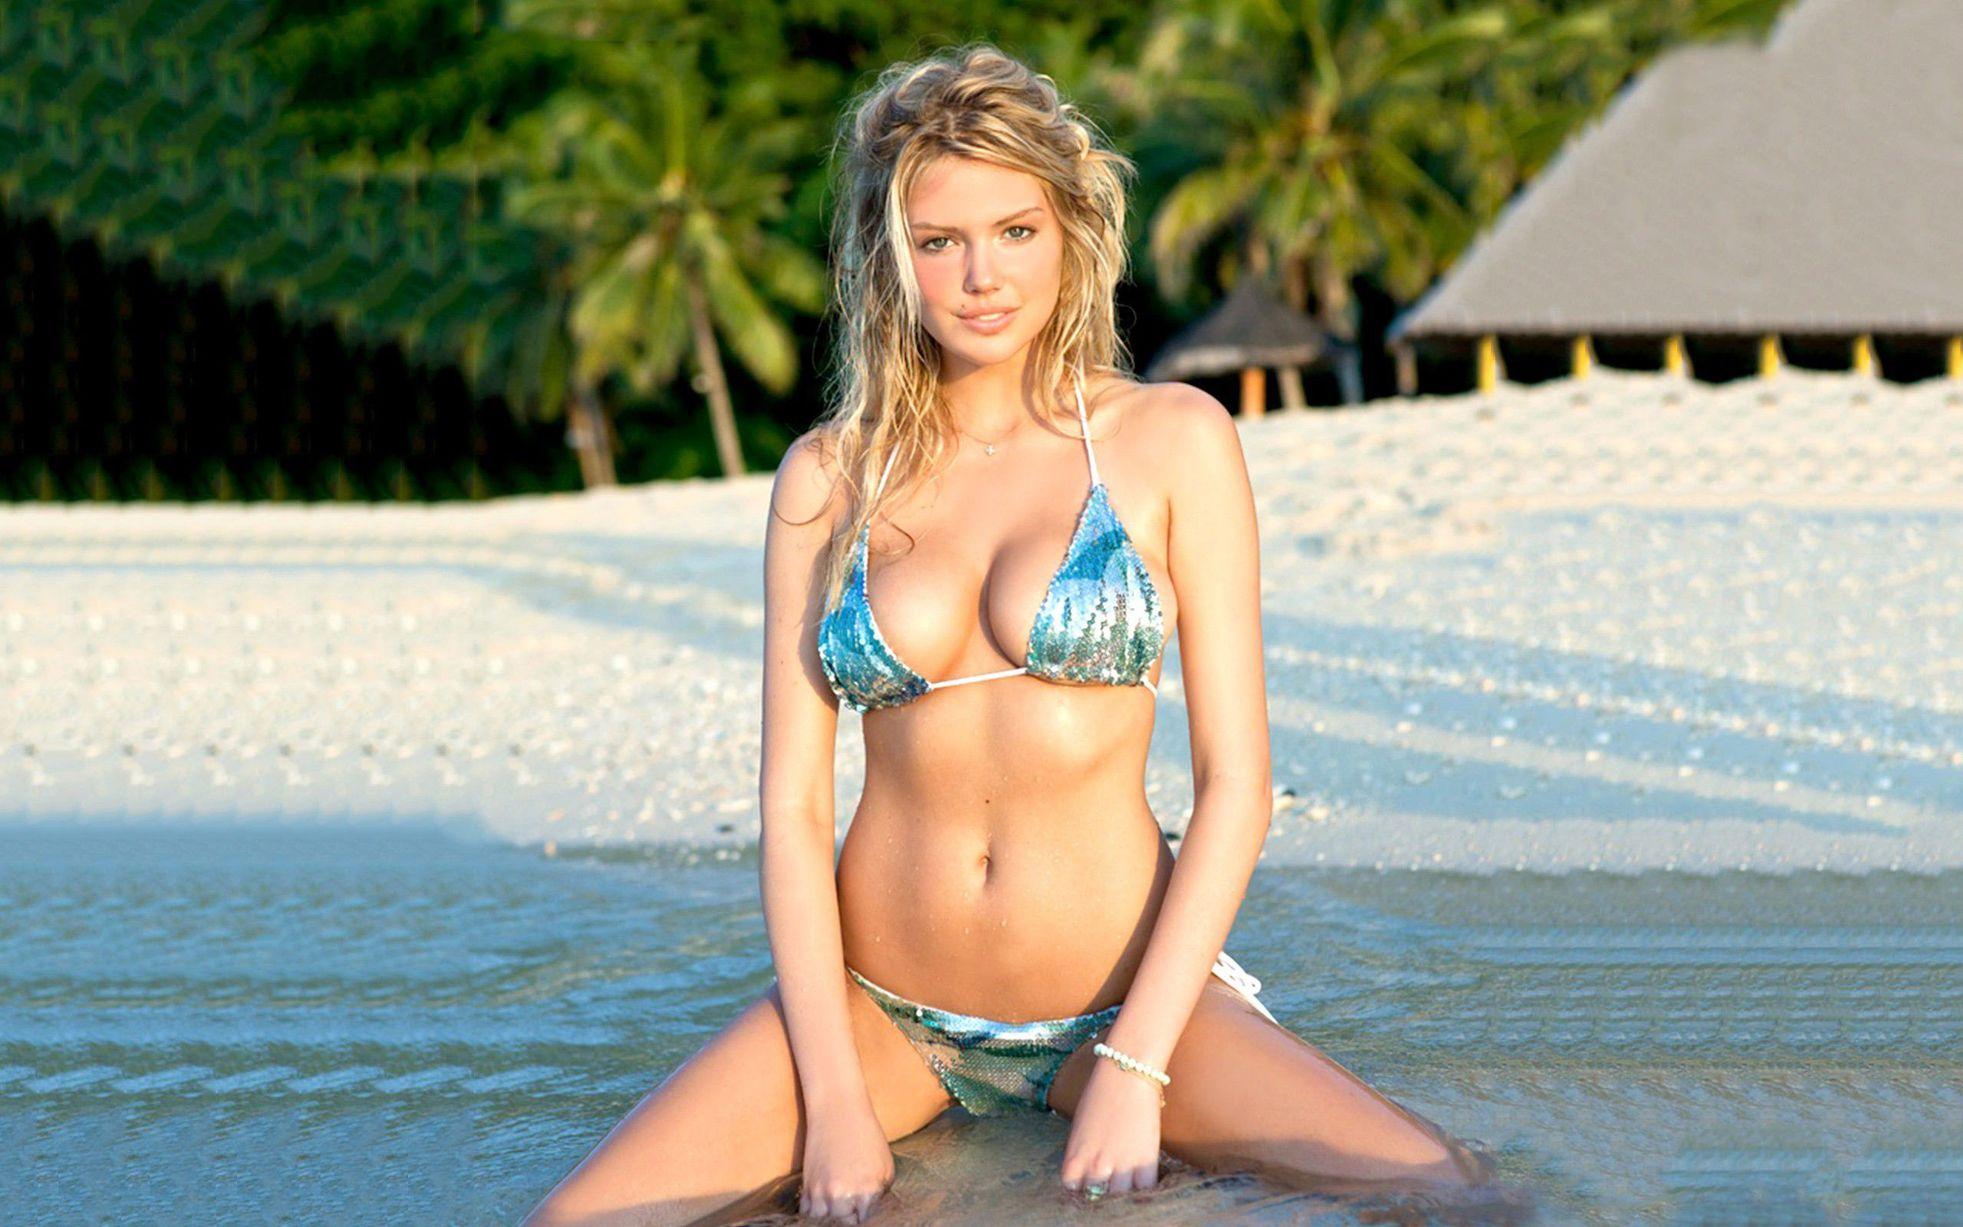 Bootylicious bikini beach babes wallpaper